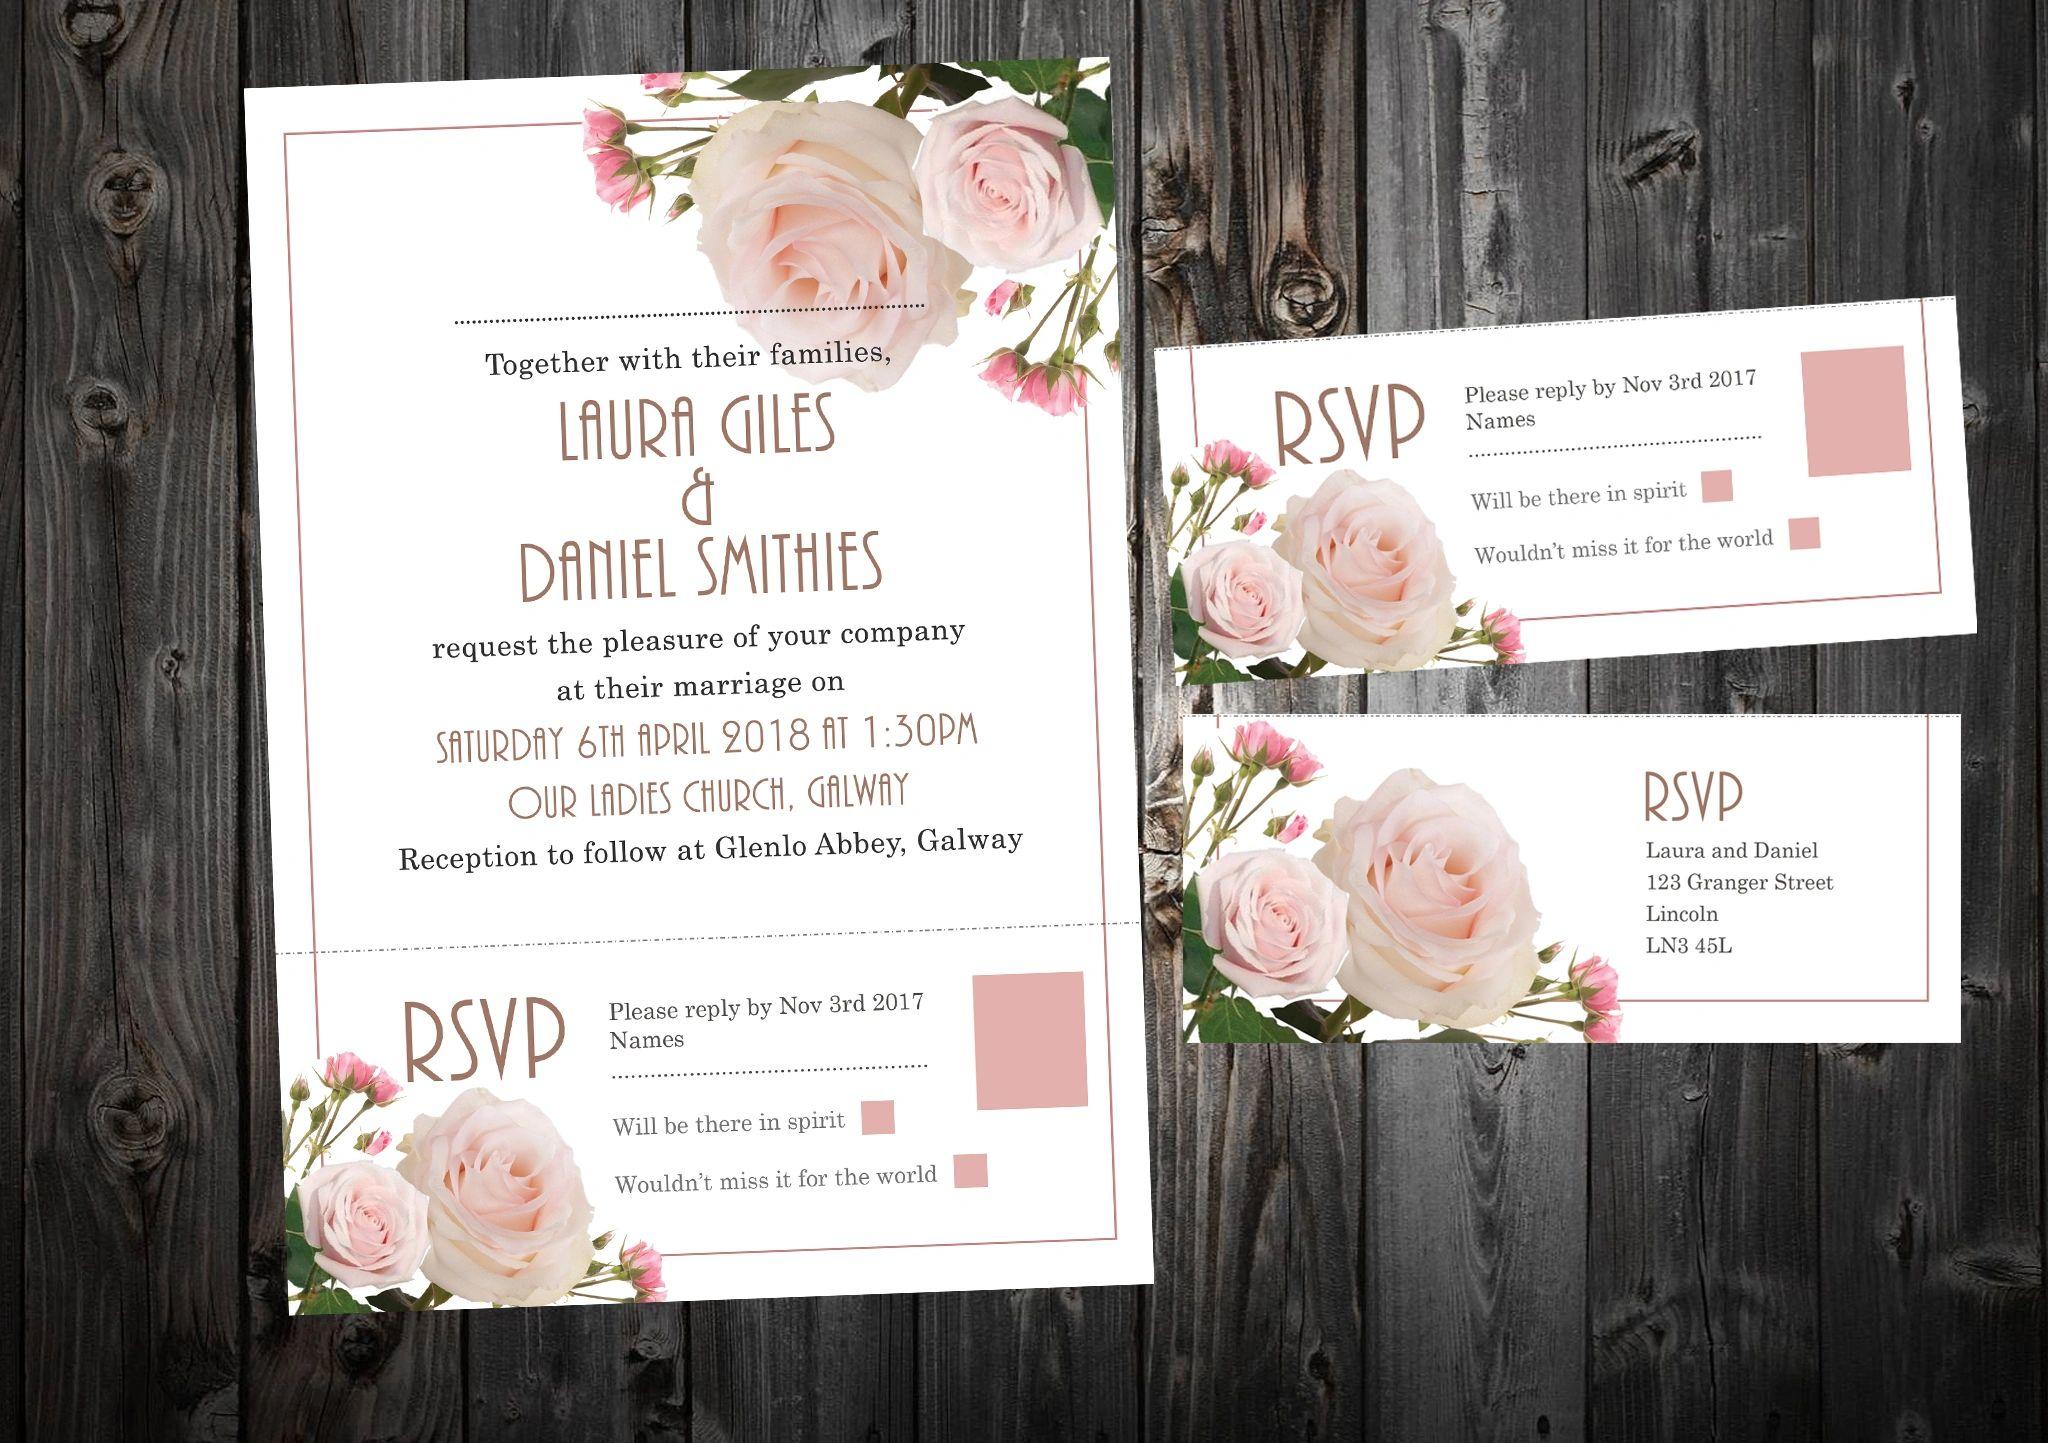 Wedding Stationery Design - Graphlex Stationery Designs | Graphlex ...